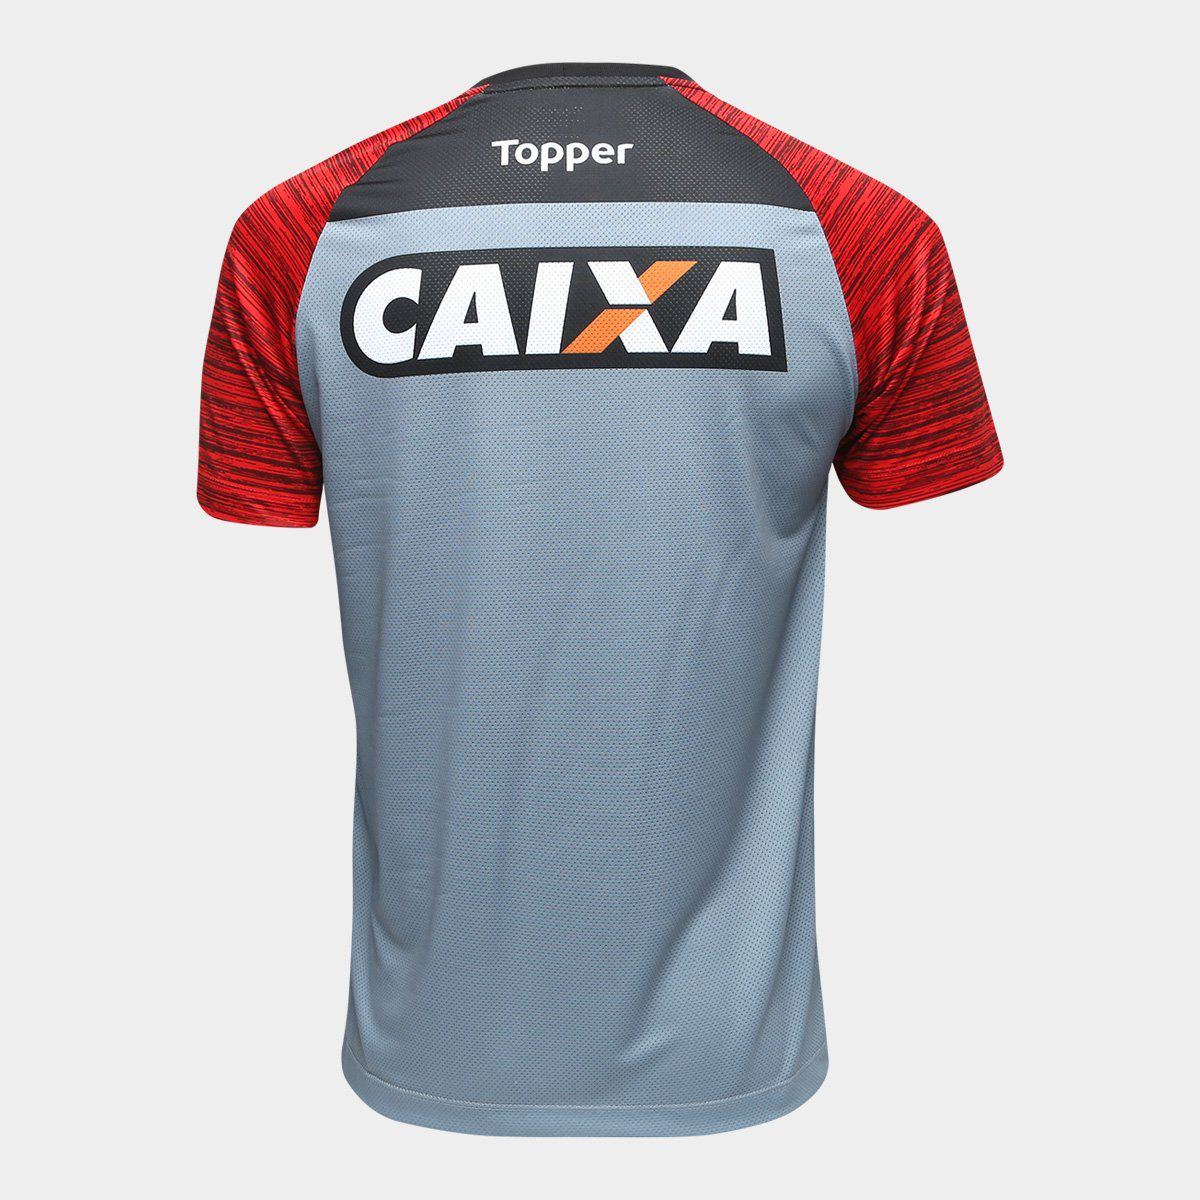 Camisa Treino Atleta- Feminino - Topper - 2018 - Cinza